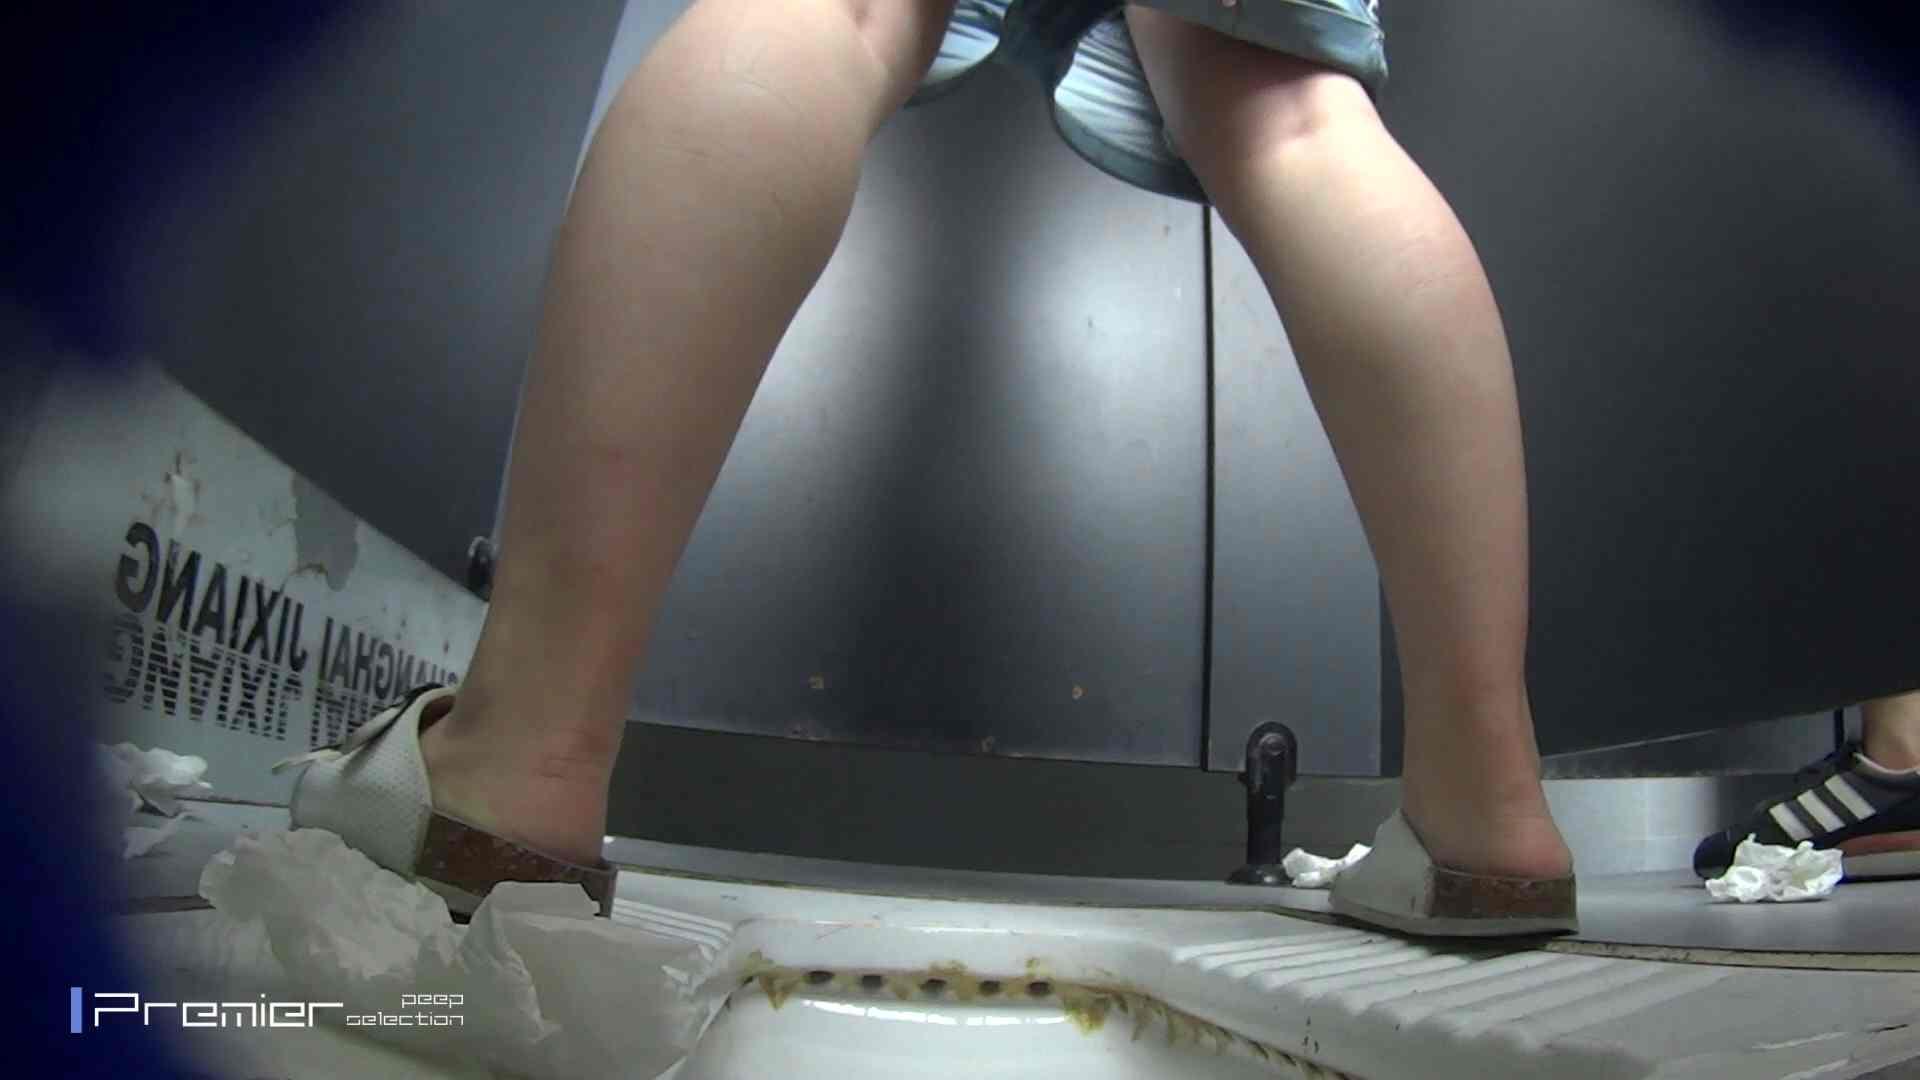 聖水ダラダラ色美女の洗面所 大学休憩時間の洗面所事情55 洗面所  55PIX 11